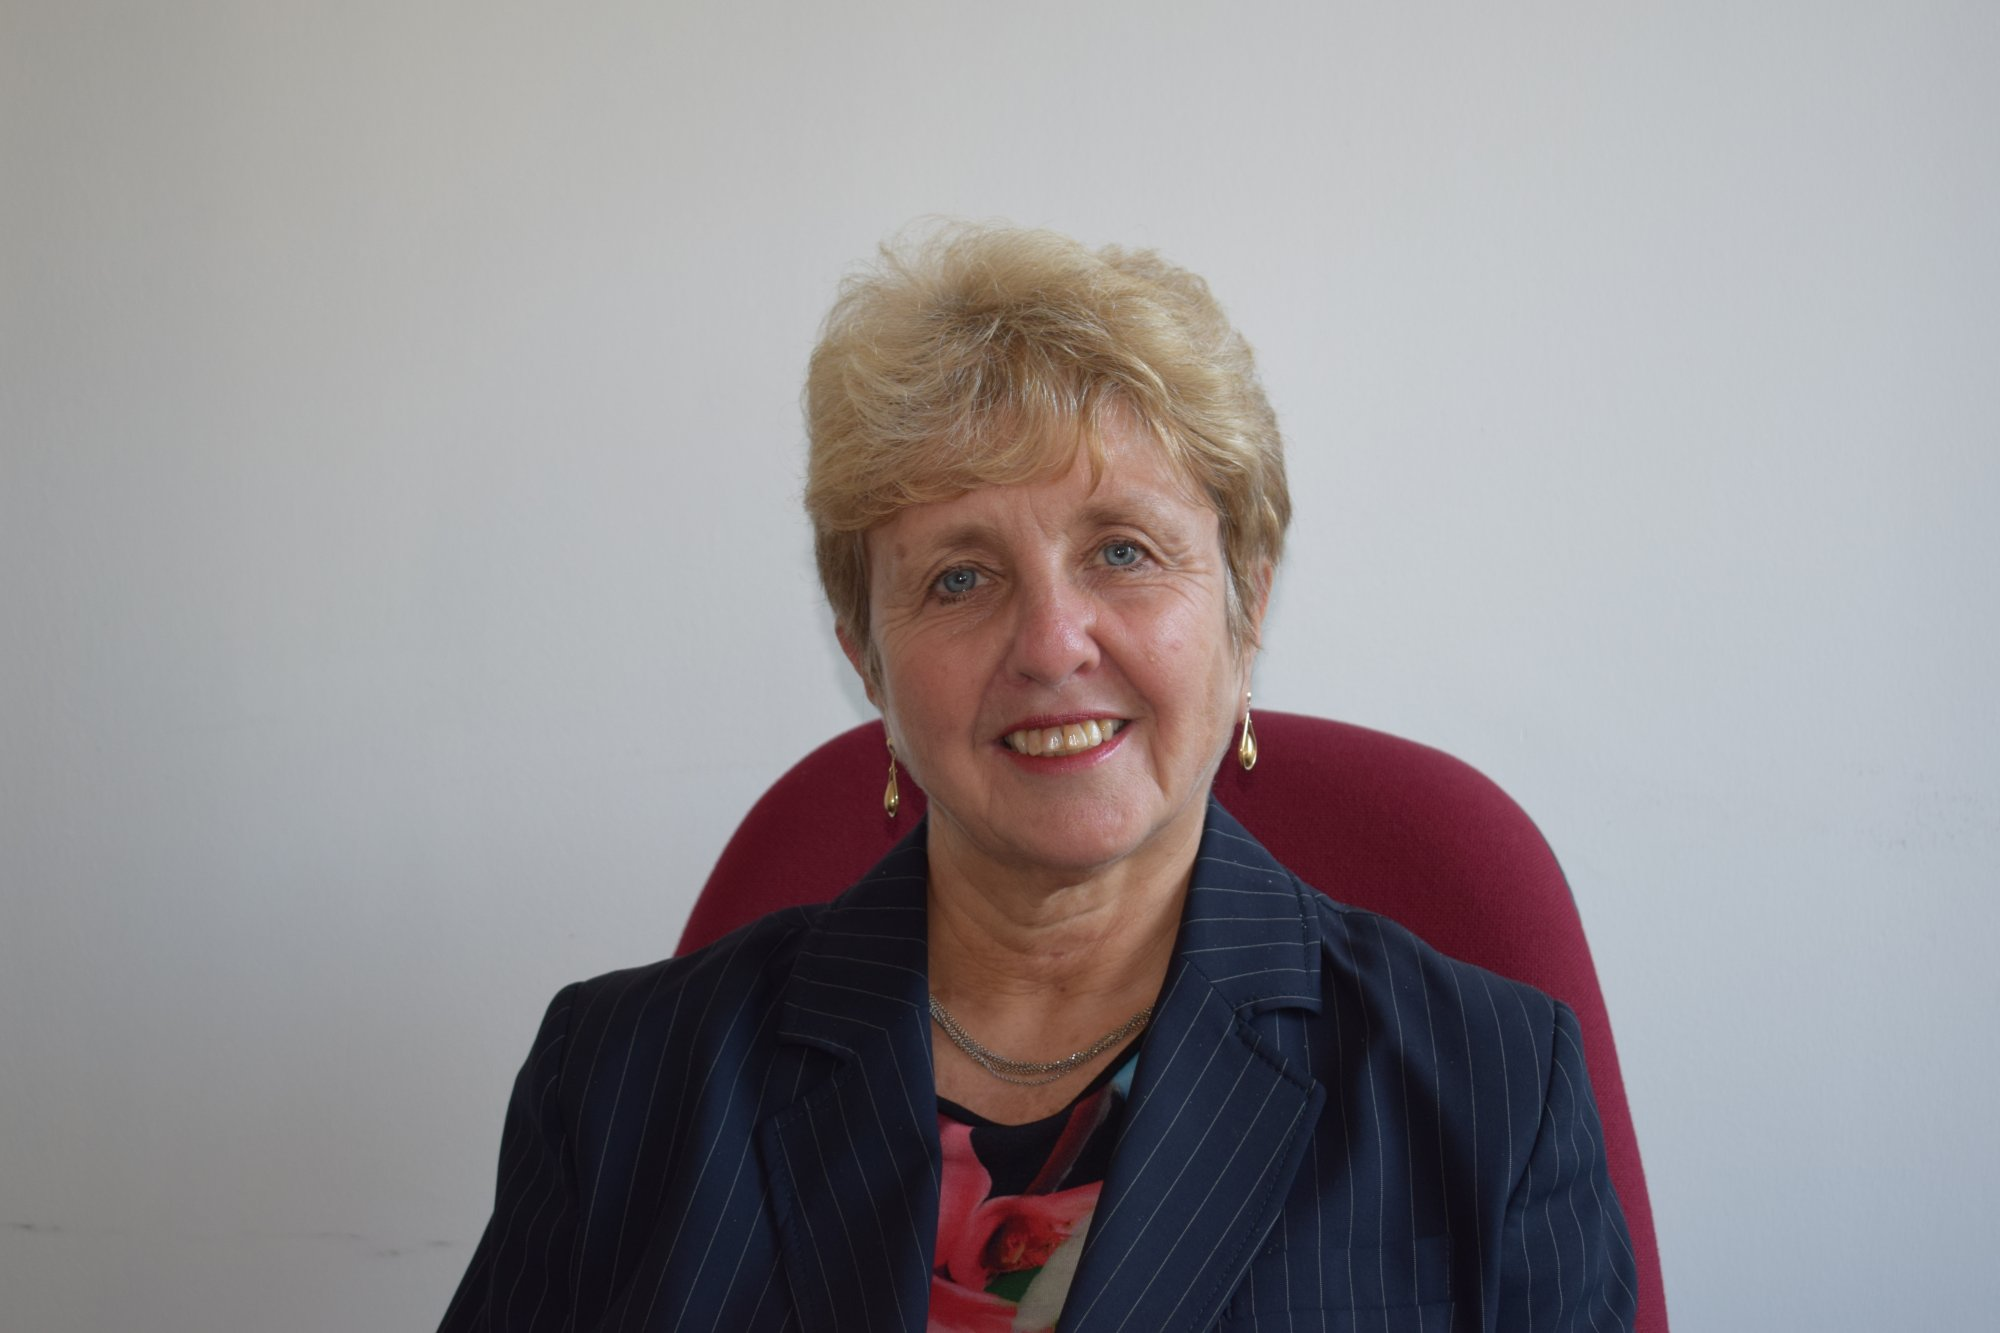 Professor Francesca Klug OBE